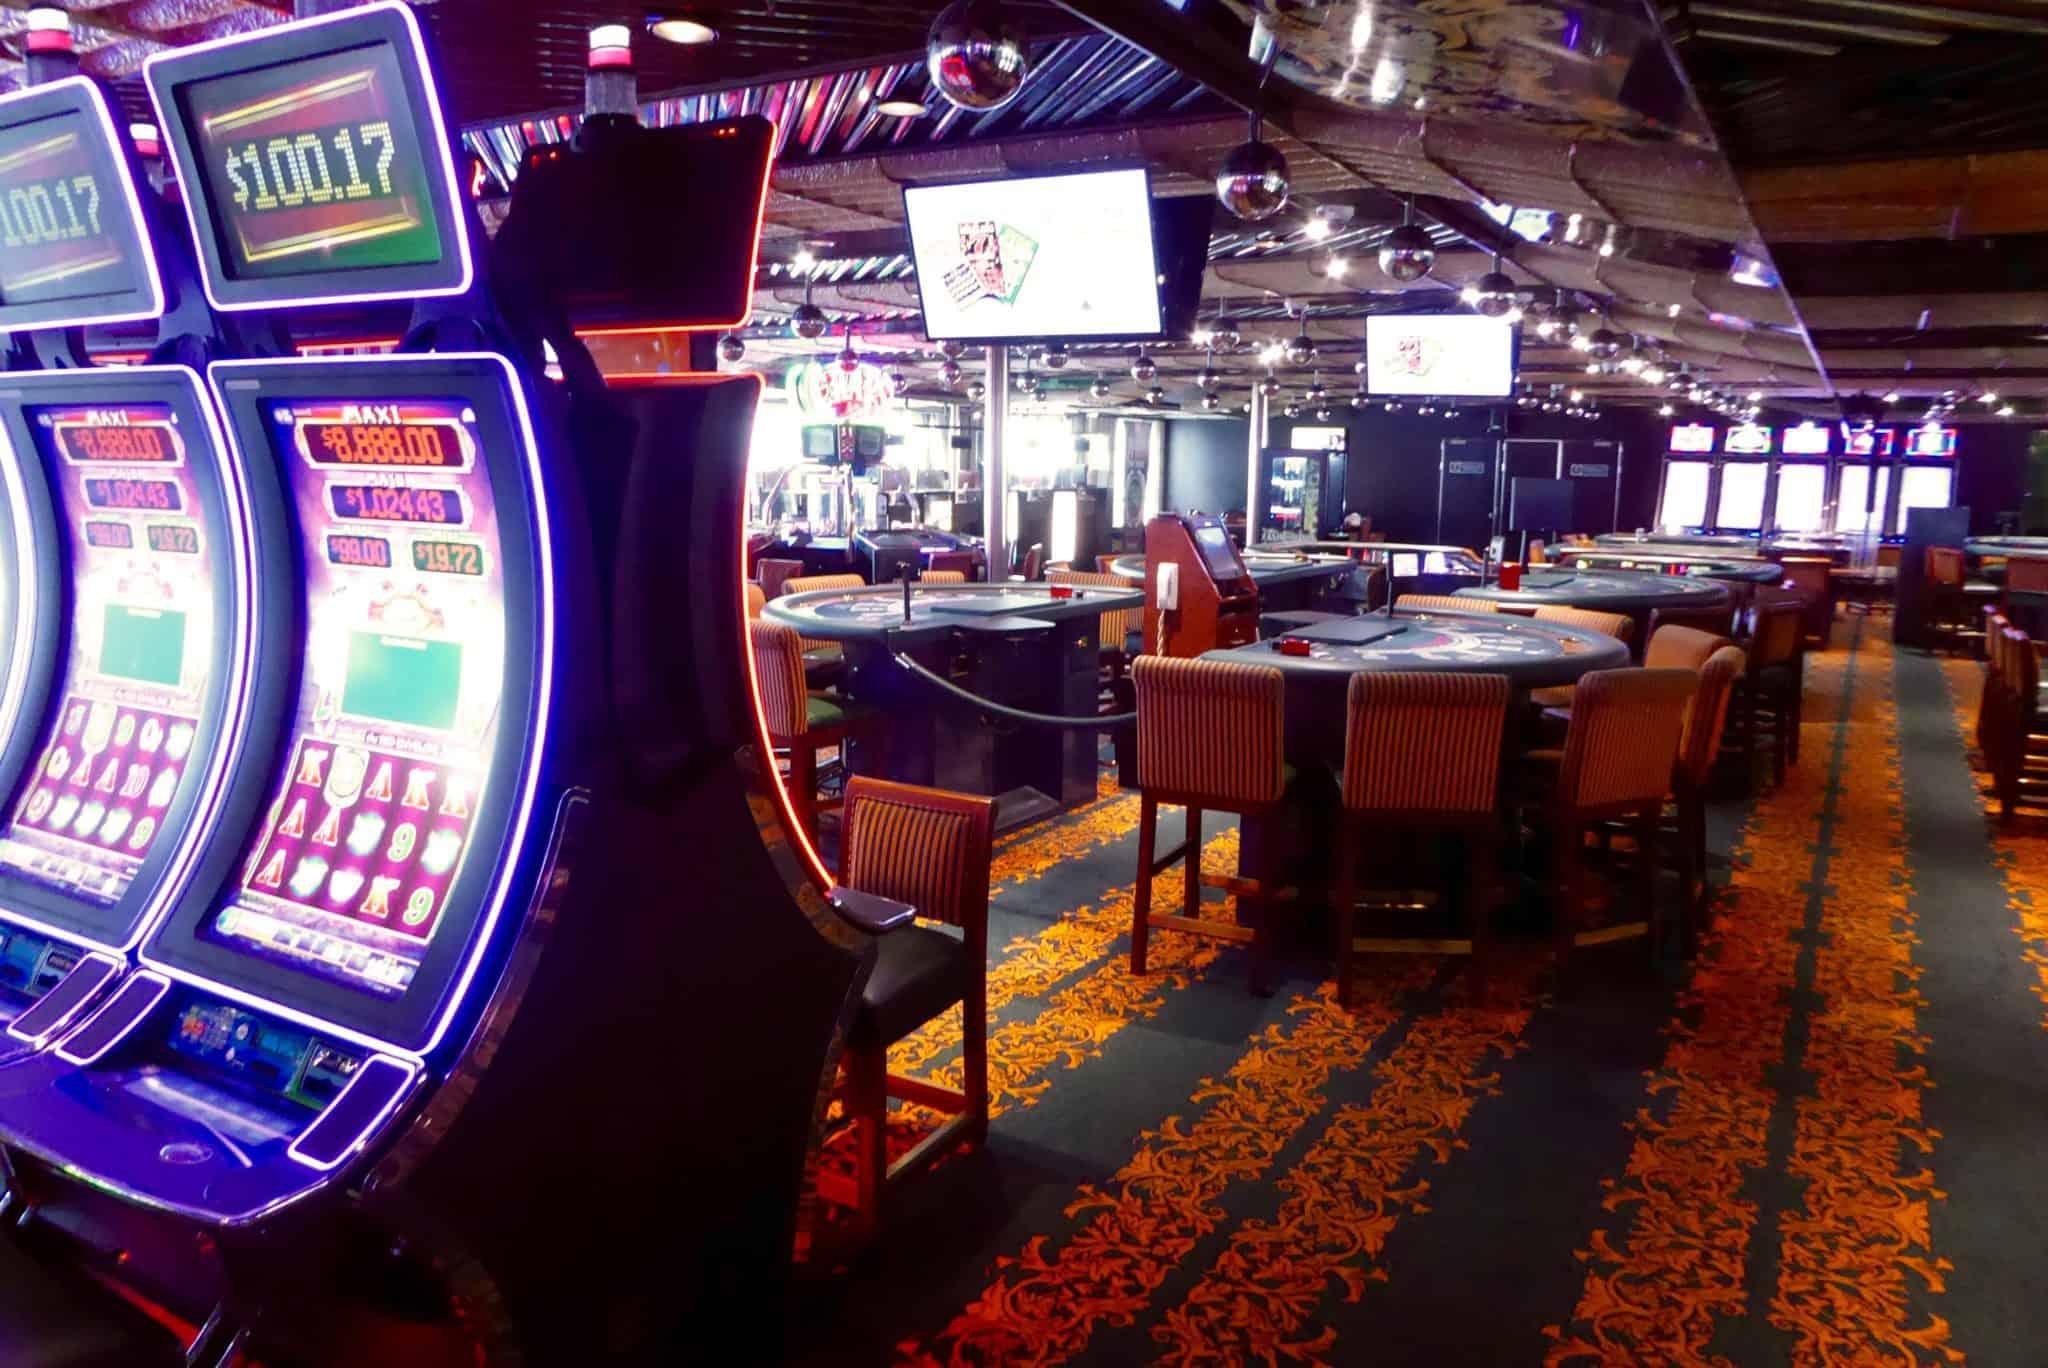 monte carlo casino on the carnival inspiration cruise ship